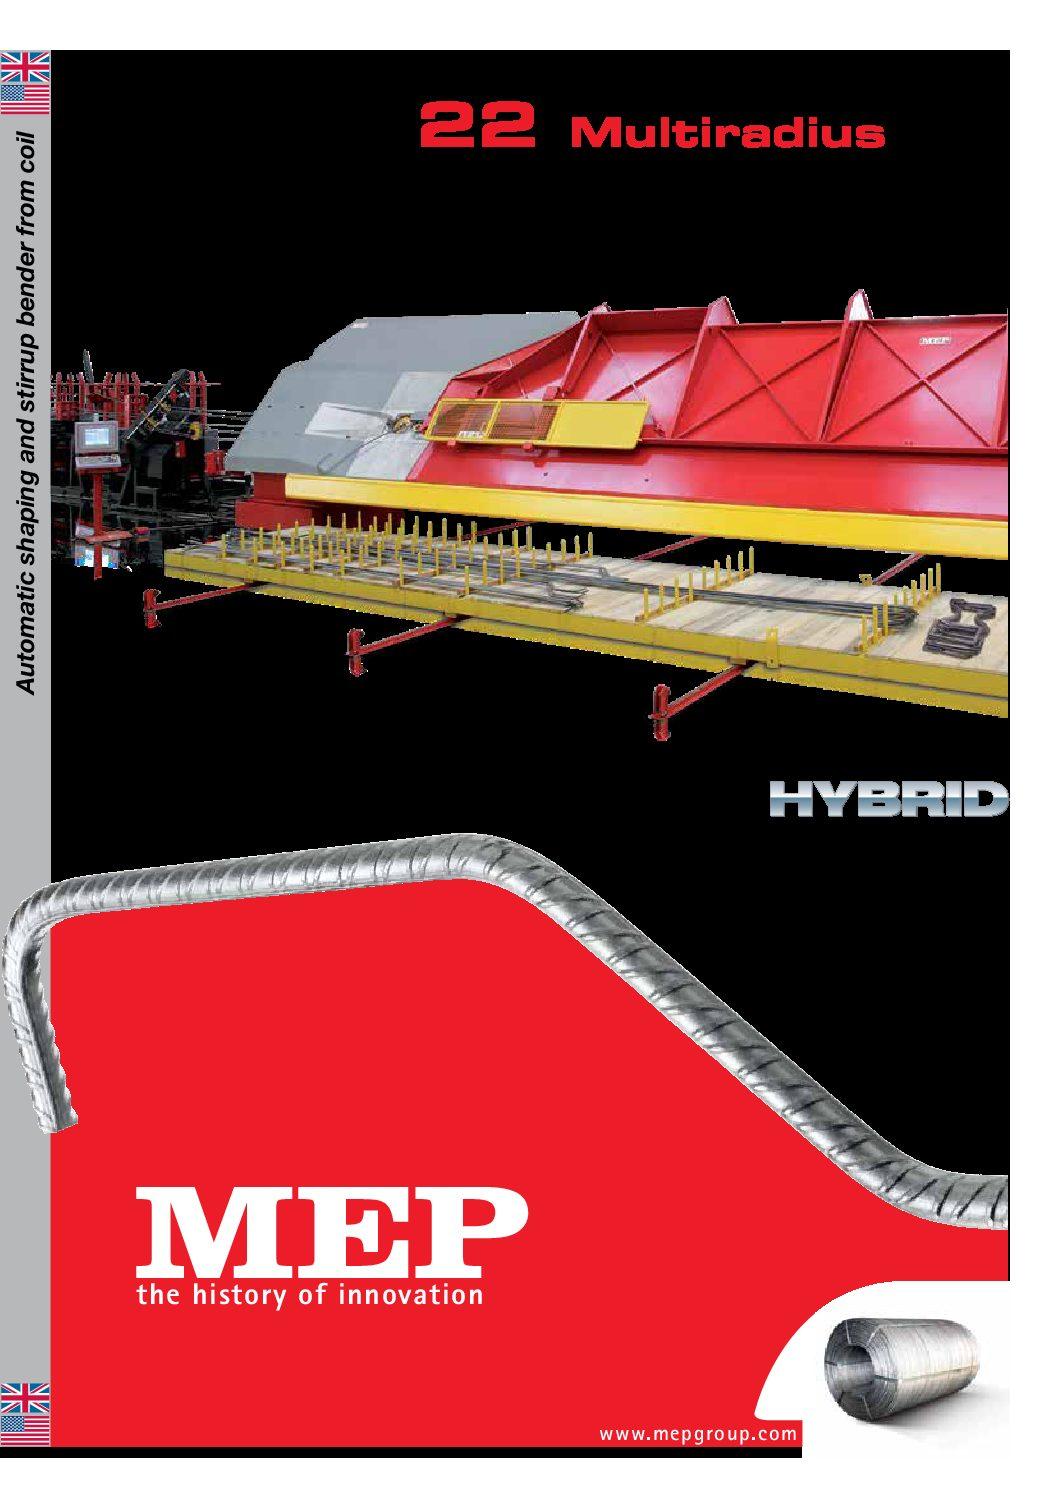 MEP - Planet22Multiradius